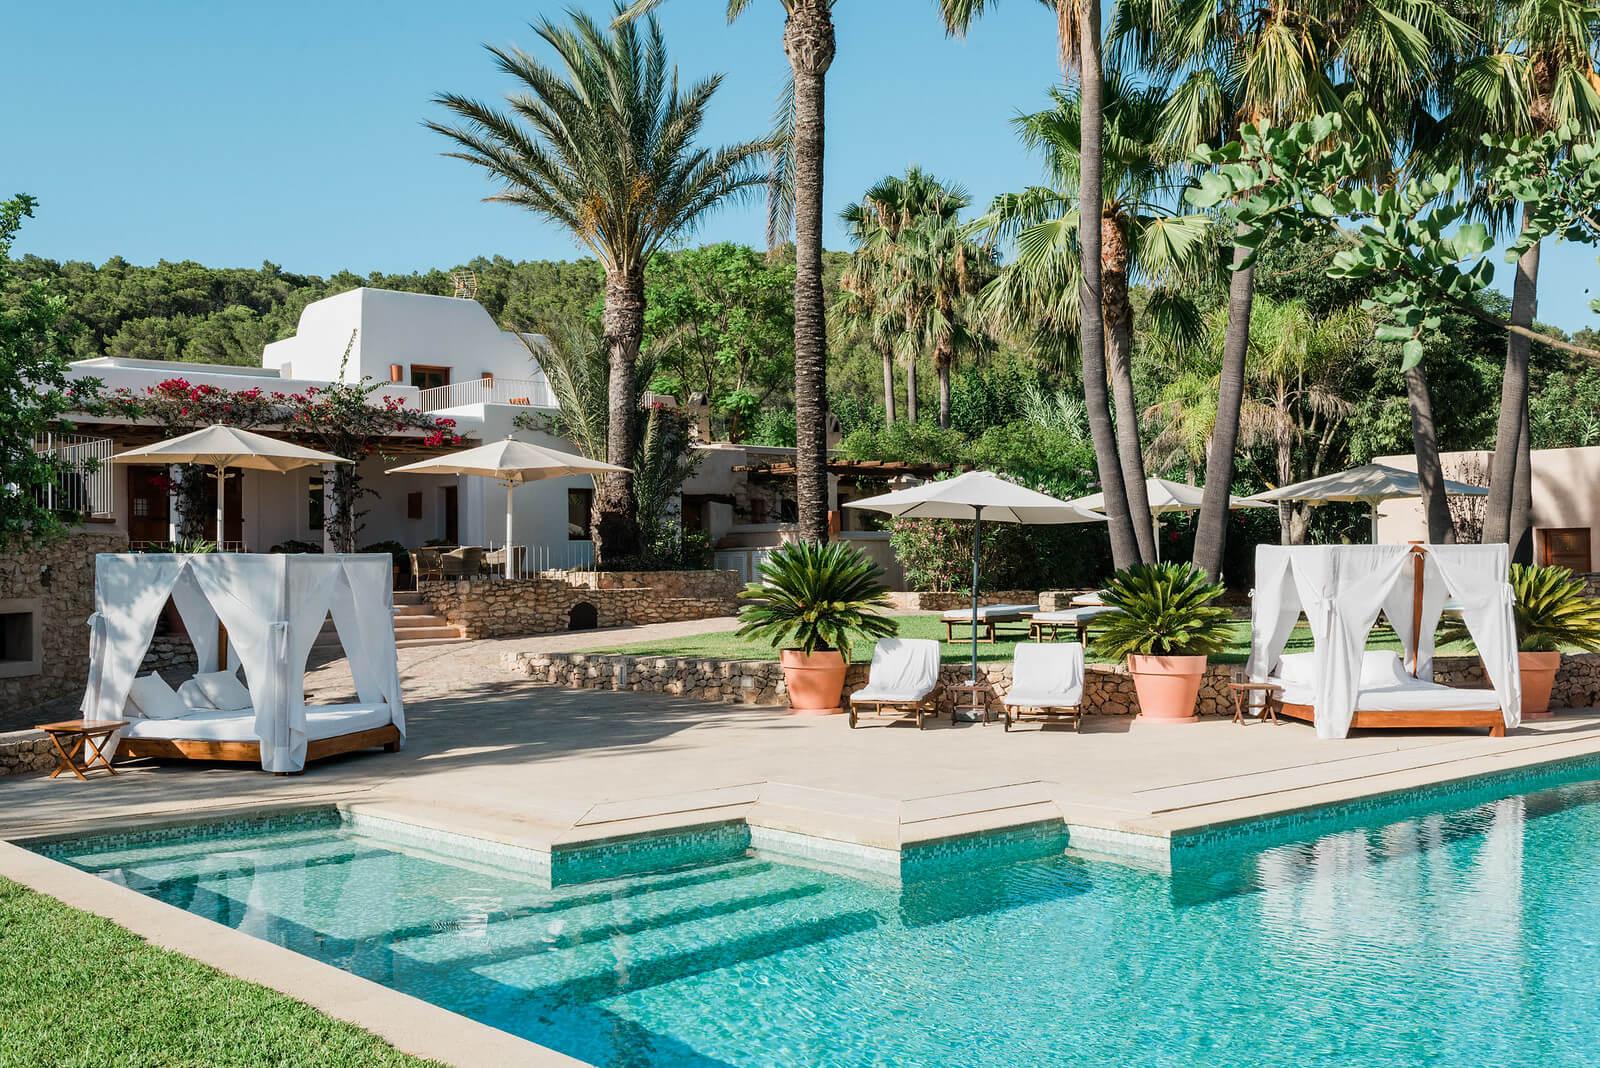 Hidden holidays in the heart of Ibiza